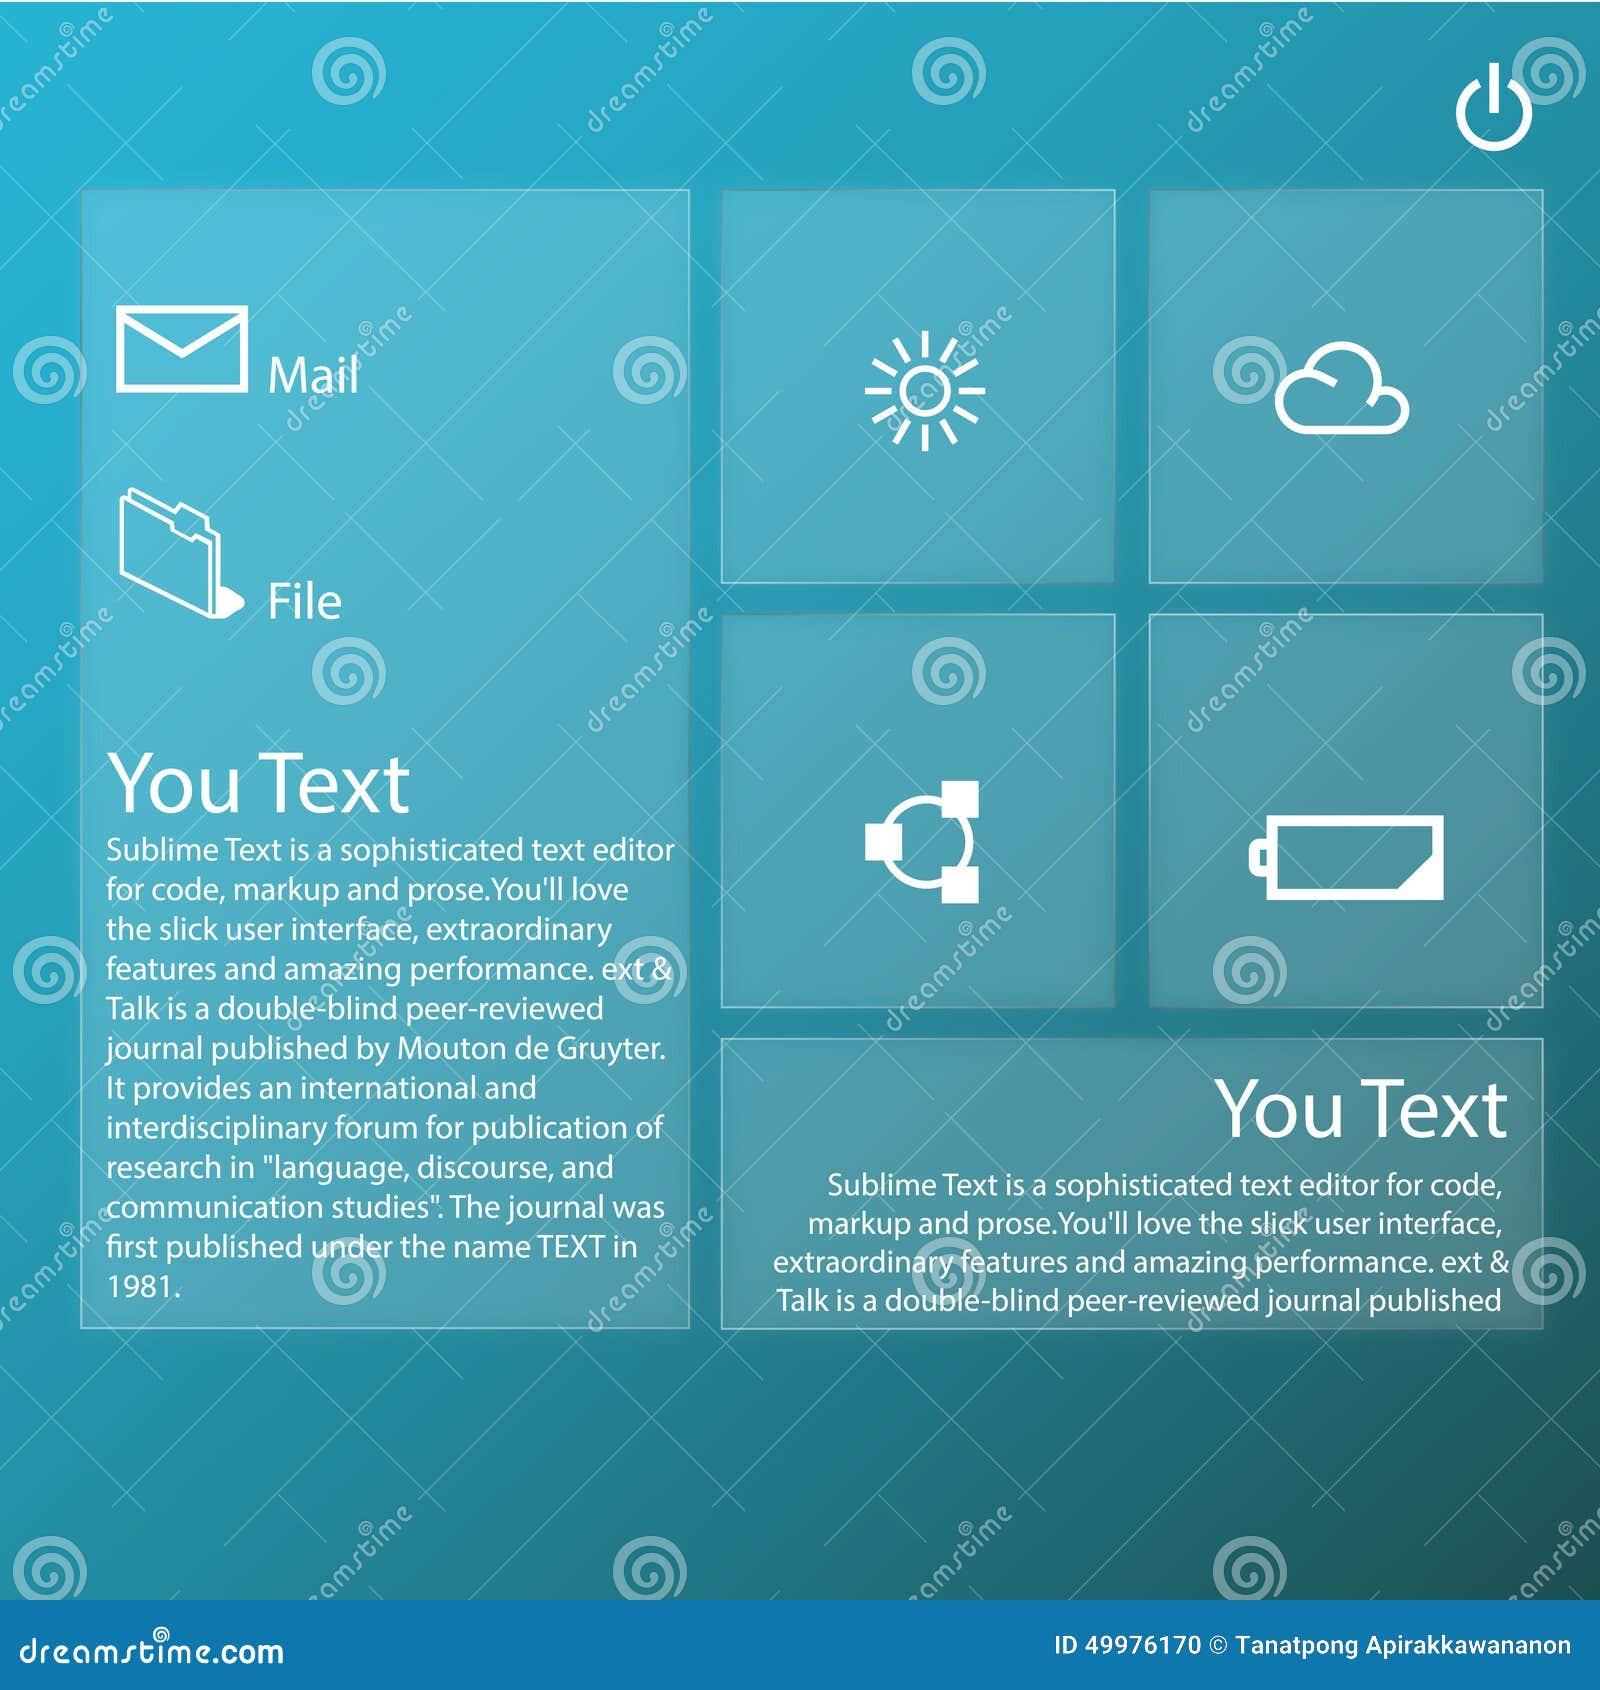 graphic design technology essay